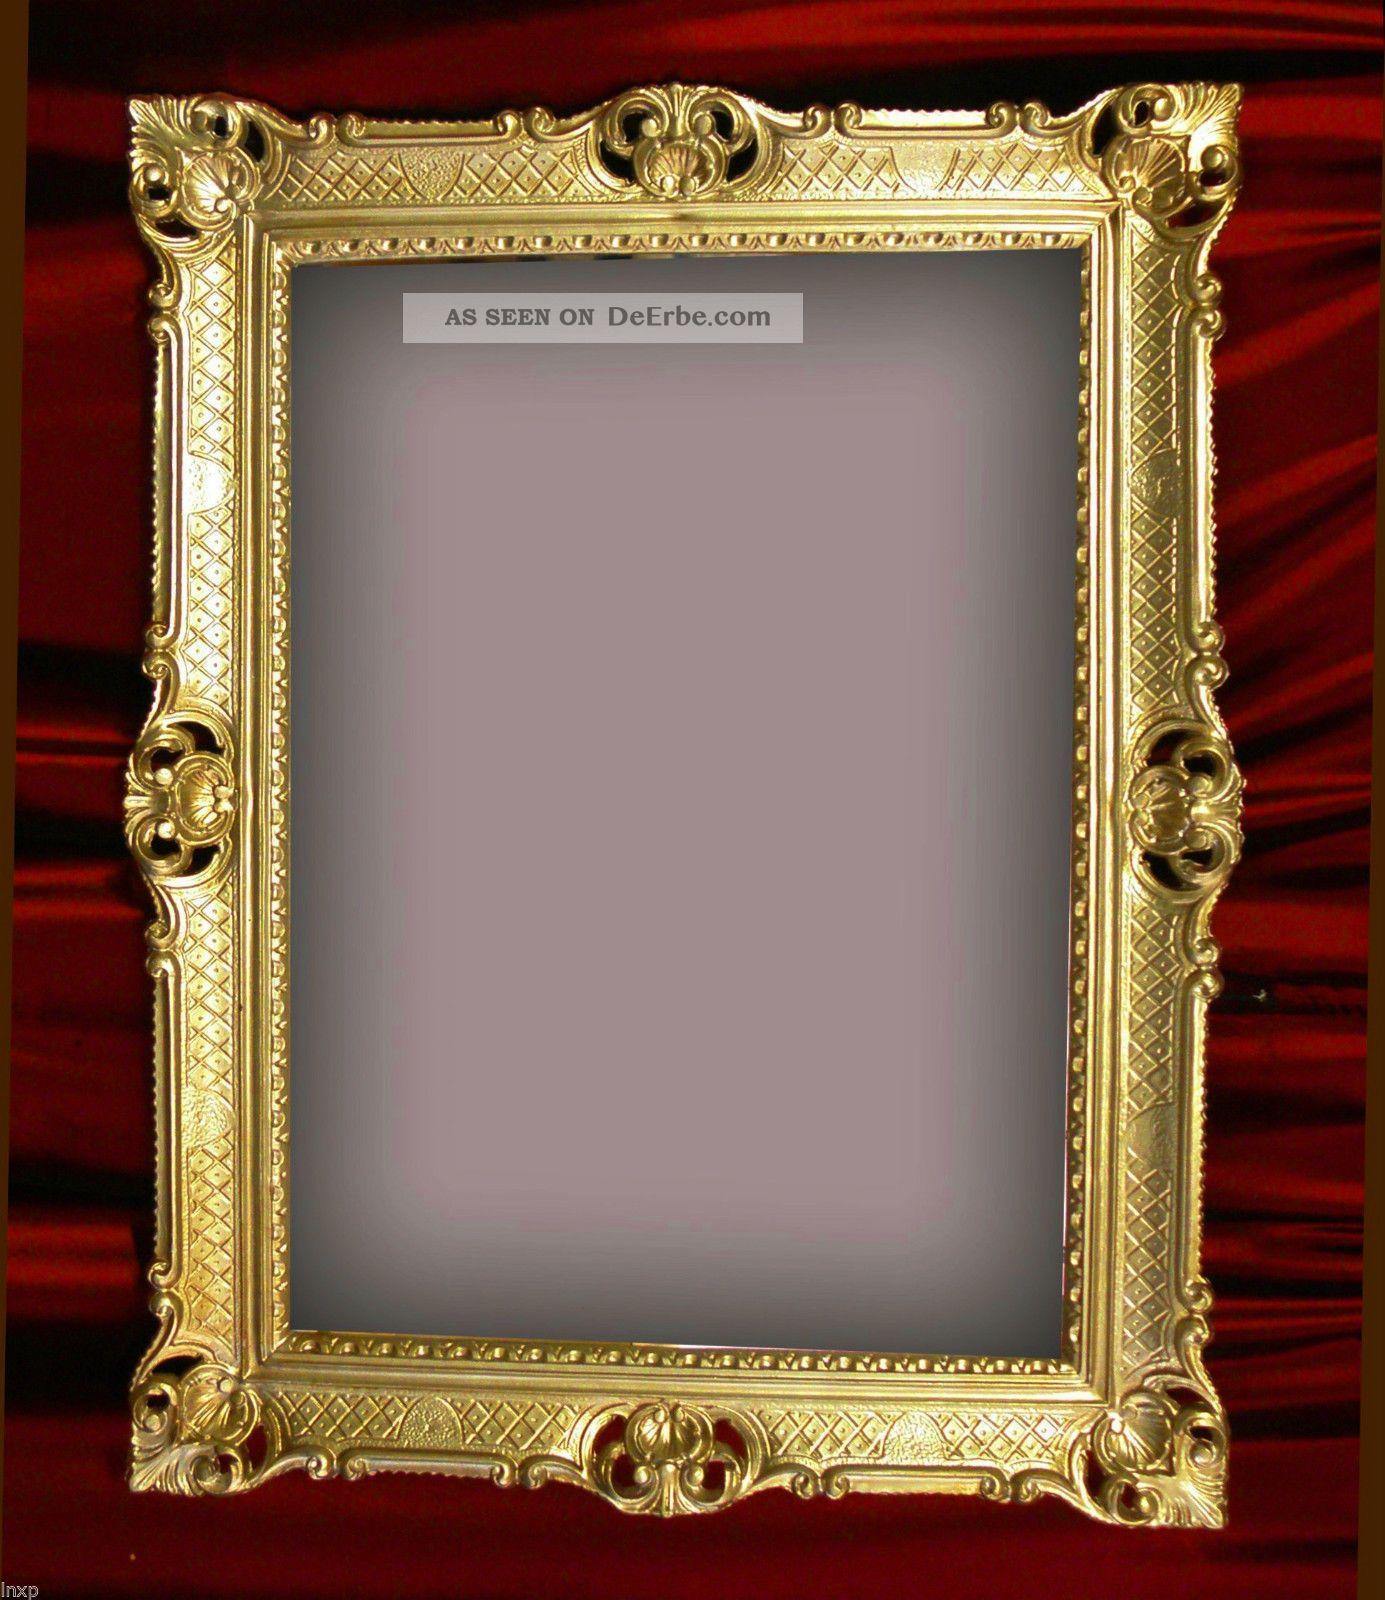 wandspiegel gold antik barock rokoko 90x70 cm wanddeko eingangsspiegel repro. Black Bedroom Furniture Sets. Home Design Ideas